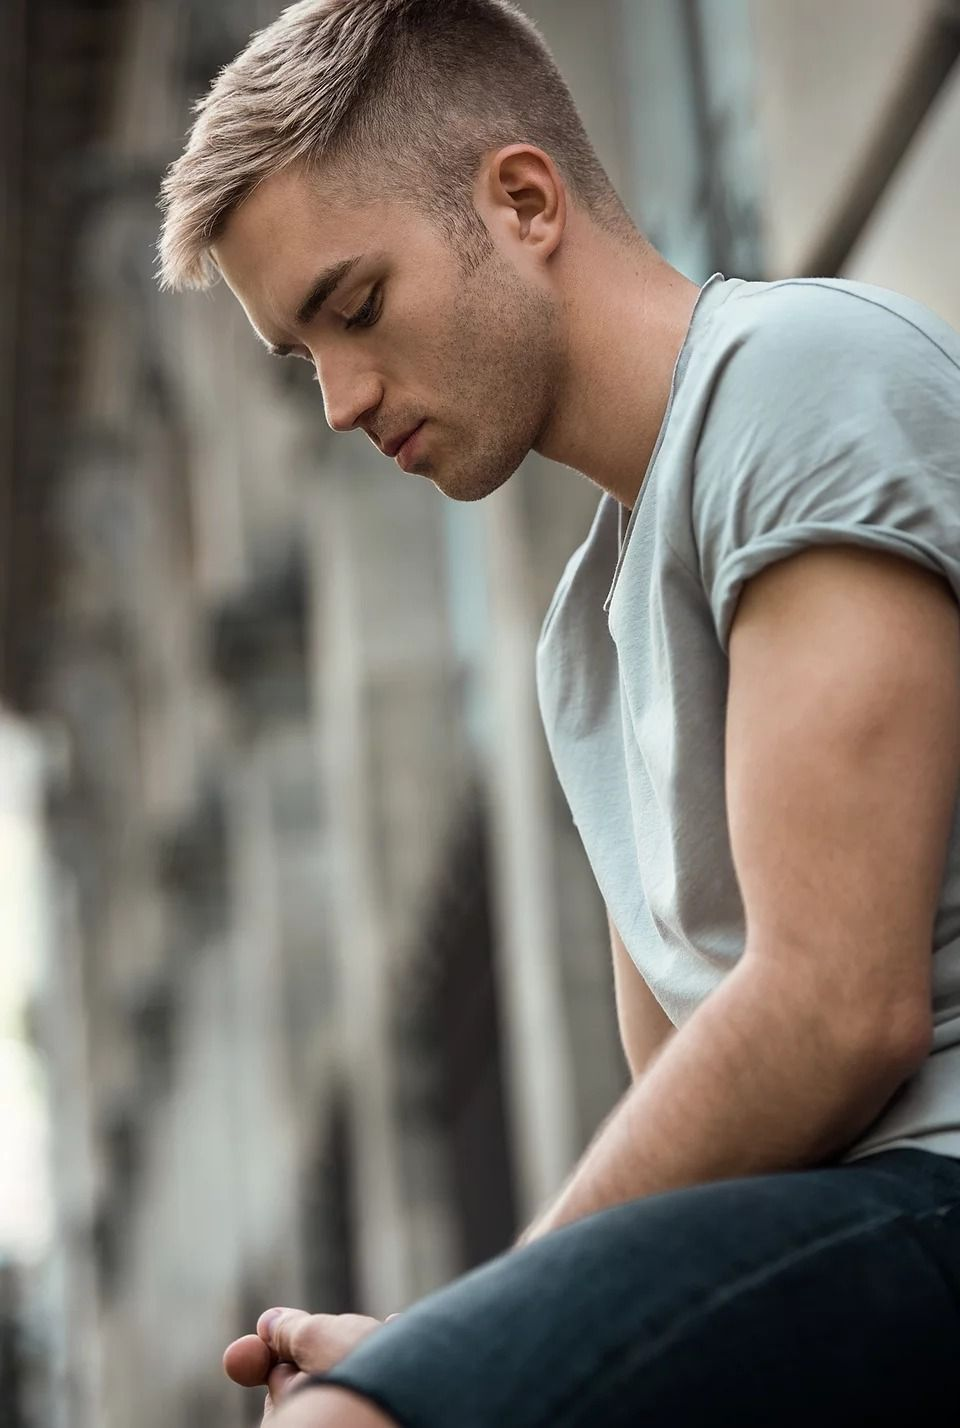 Pin Van George Op Random Kapsels Mannen Herenkapsels Blond Mannen Kort Haar